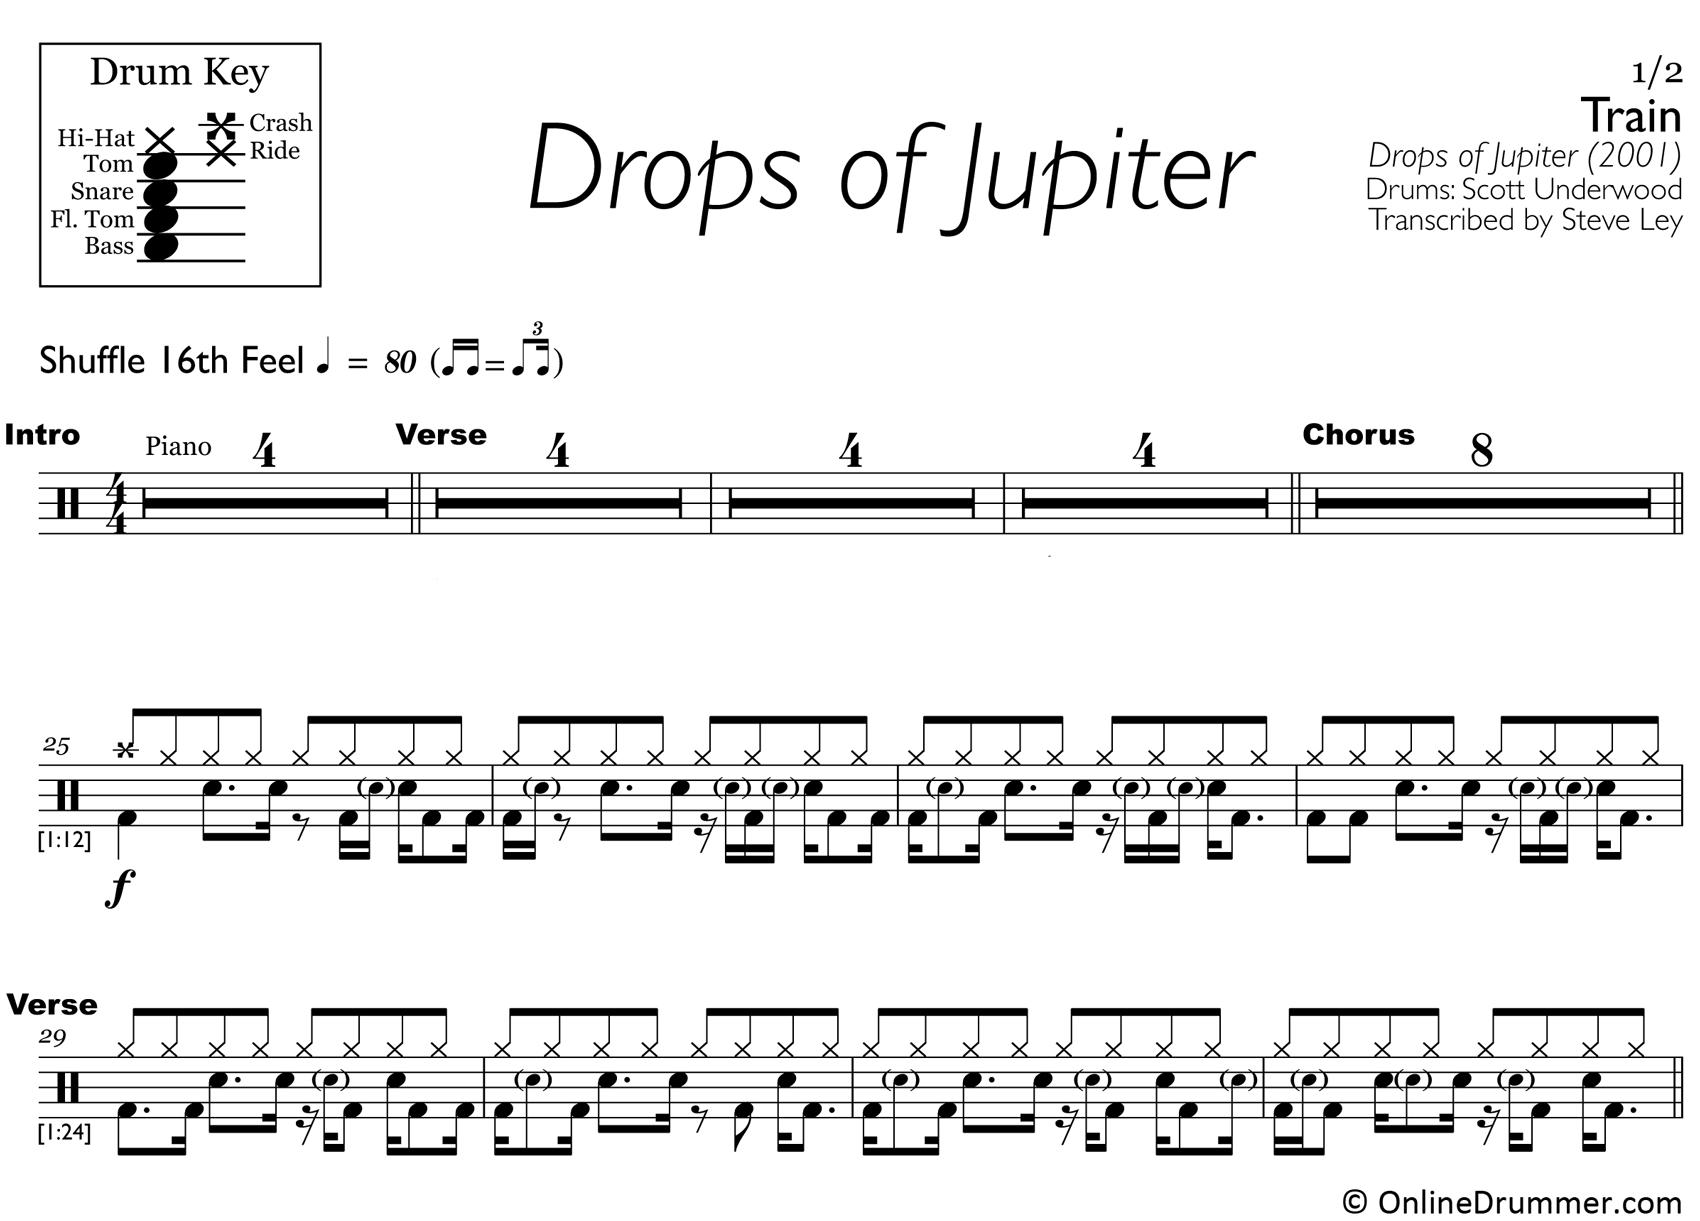 Drops of Jupiter - Train - Drum Sheet Music